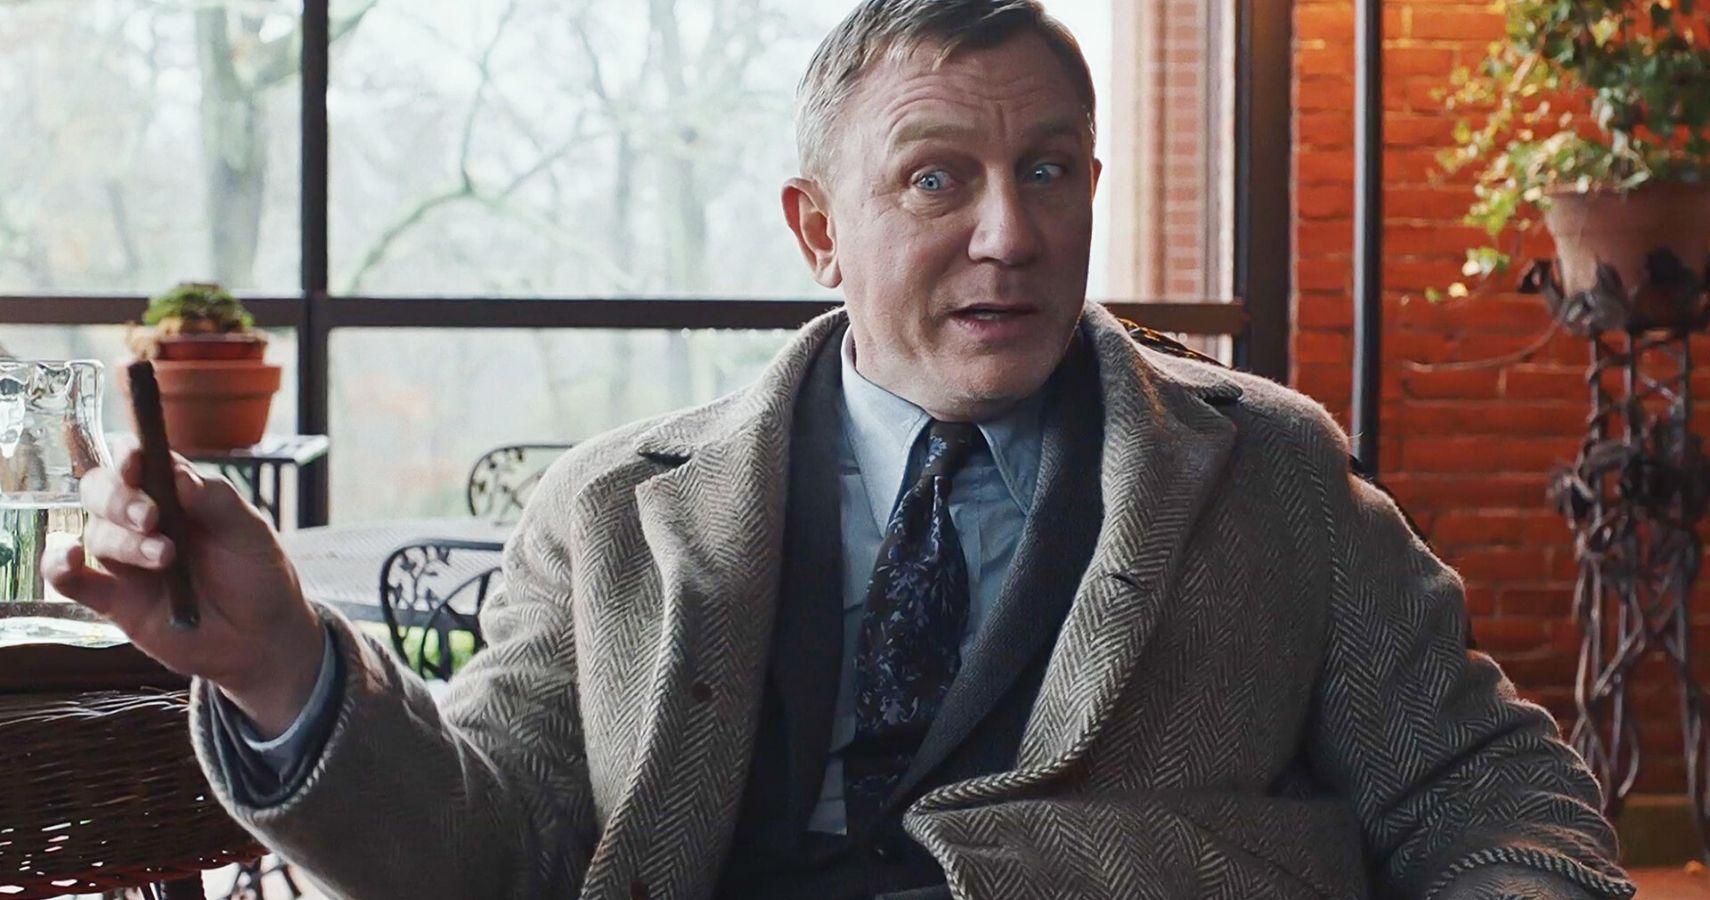 Top 10 Daniel Craig Non 007 Movies According To Rotten Tomatoes